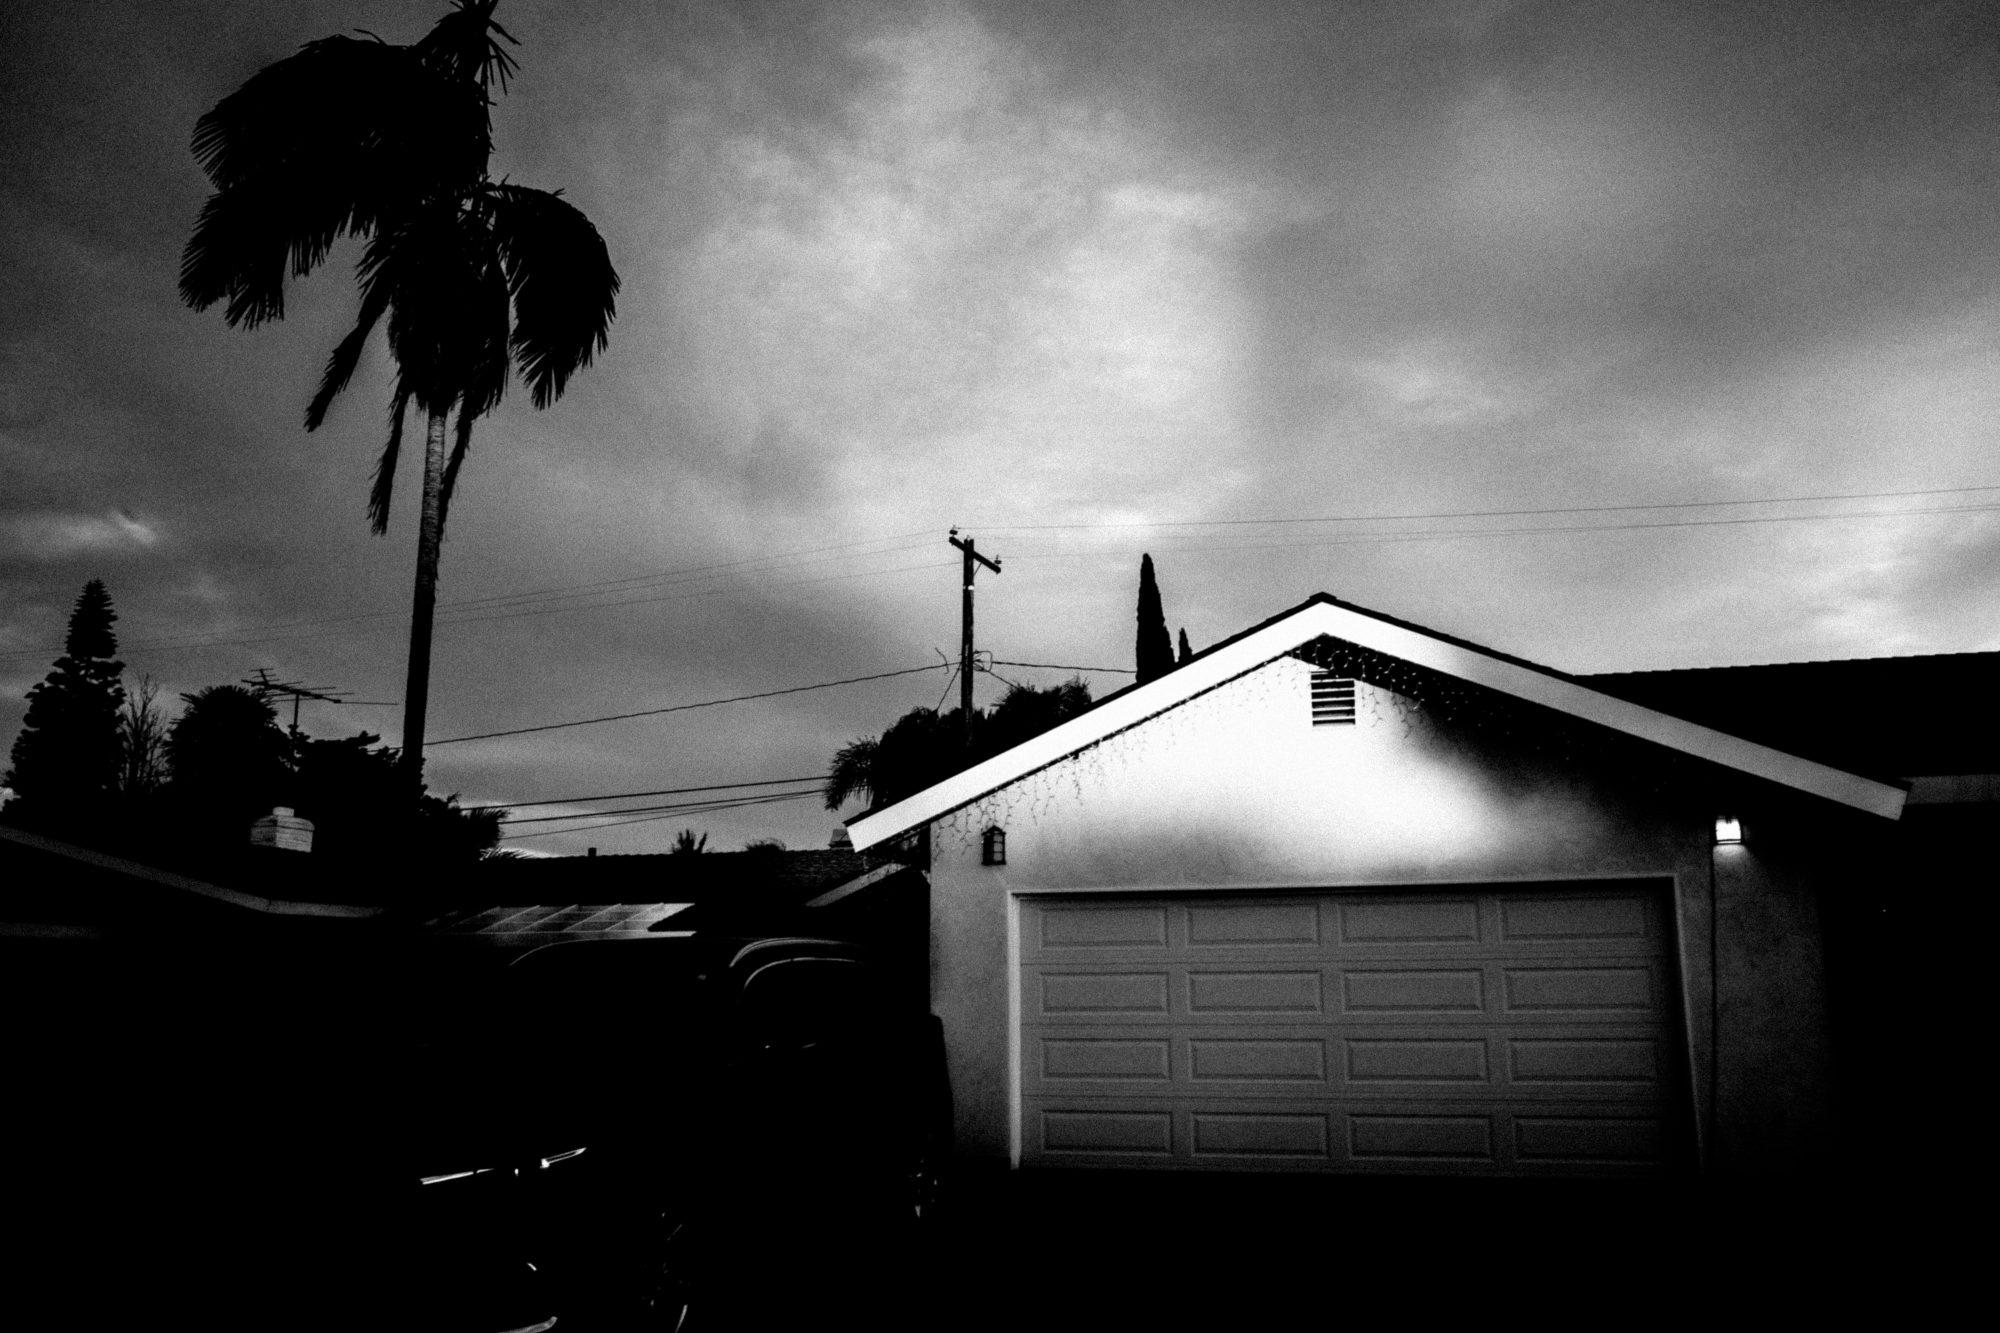 Philosophy Of Aesthetics In Photography Eric Kim